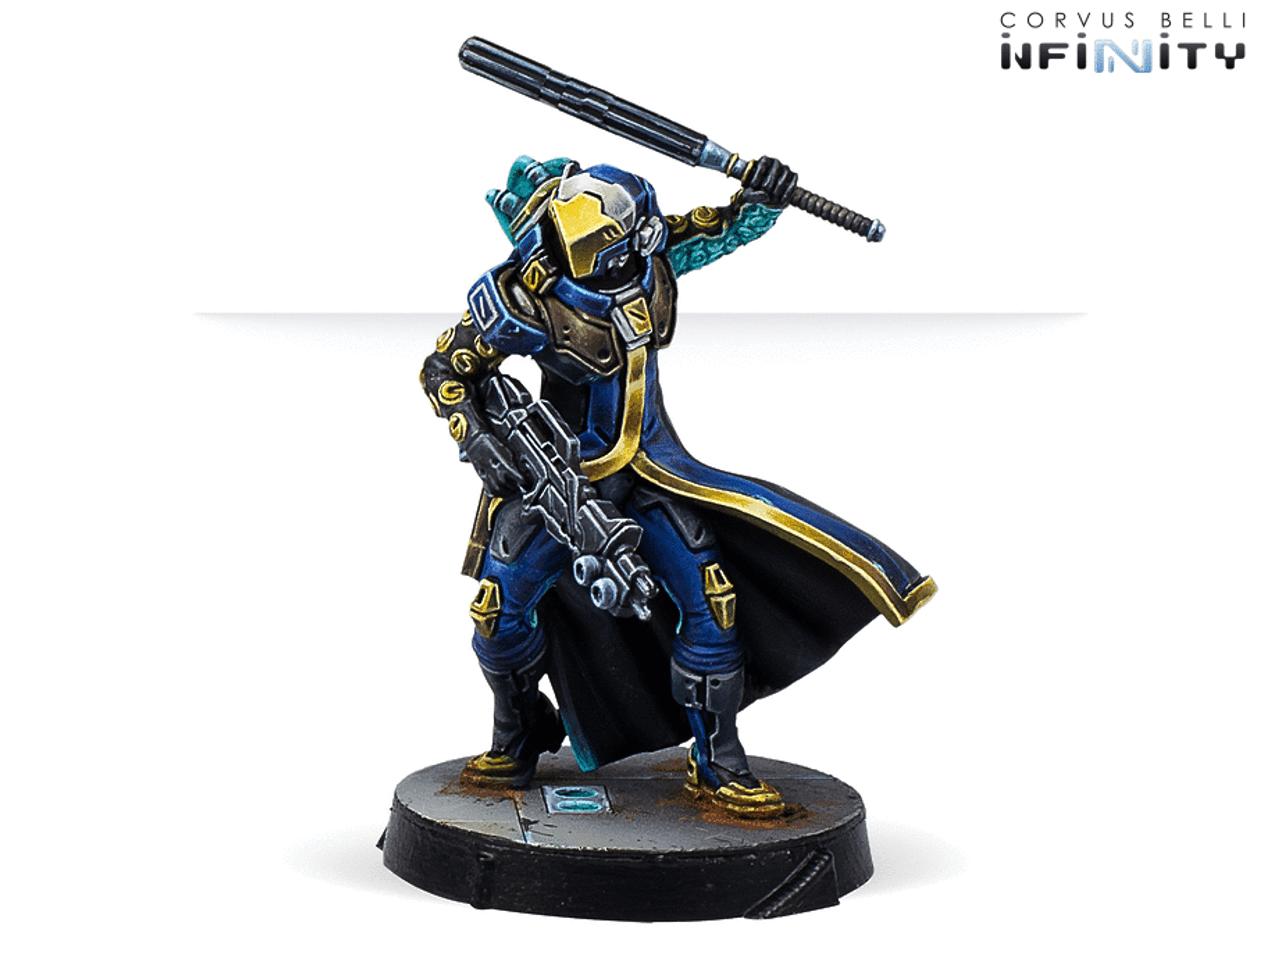 Infinity Starmada Cyberghost (Hacker, Pitcher) - O-12